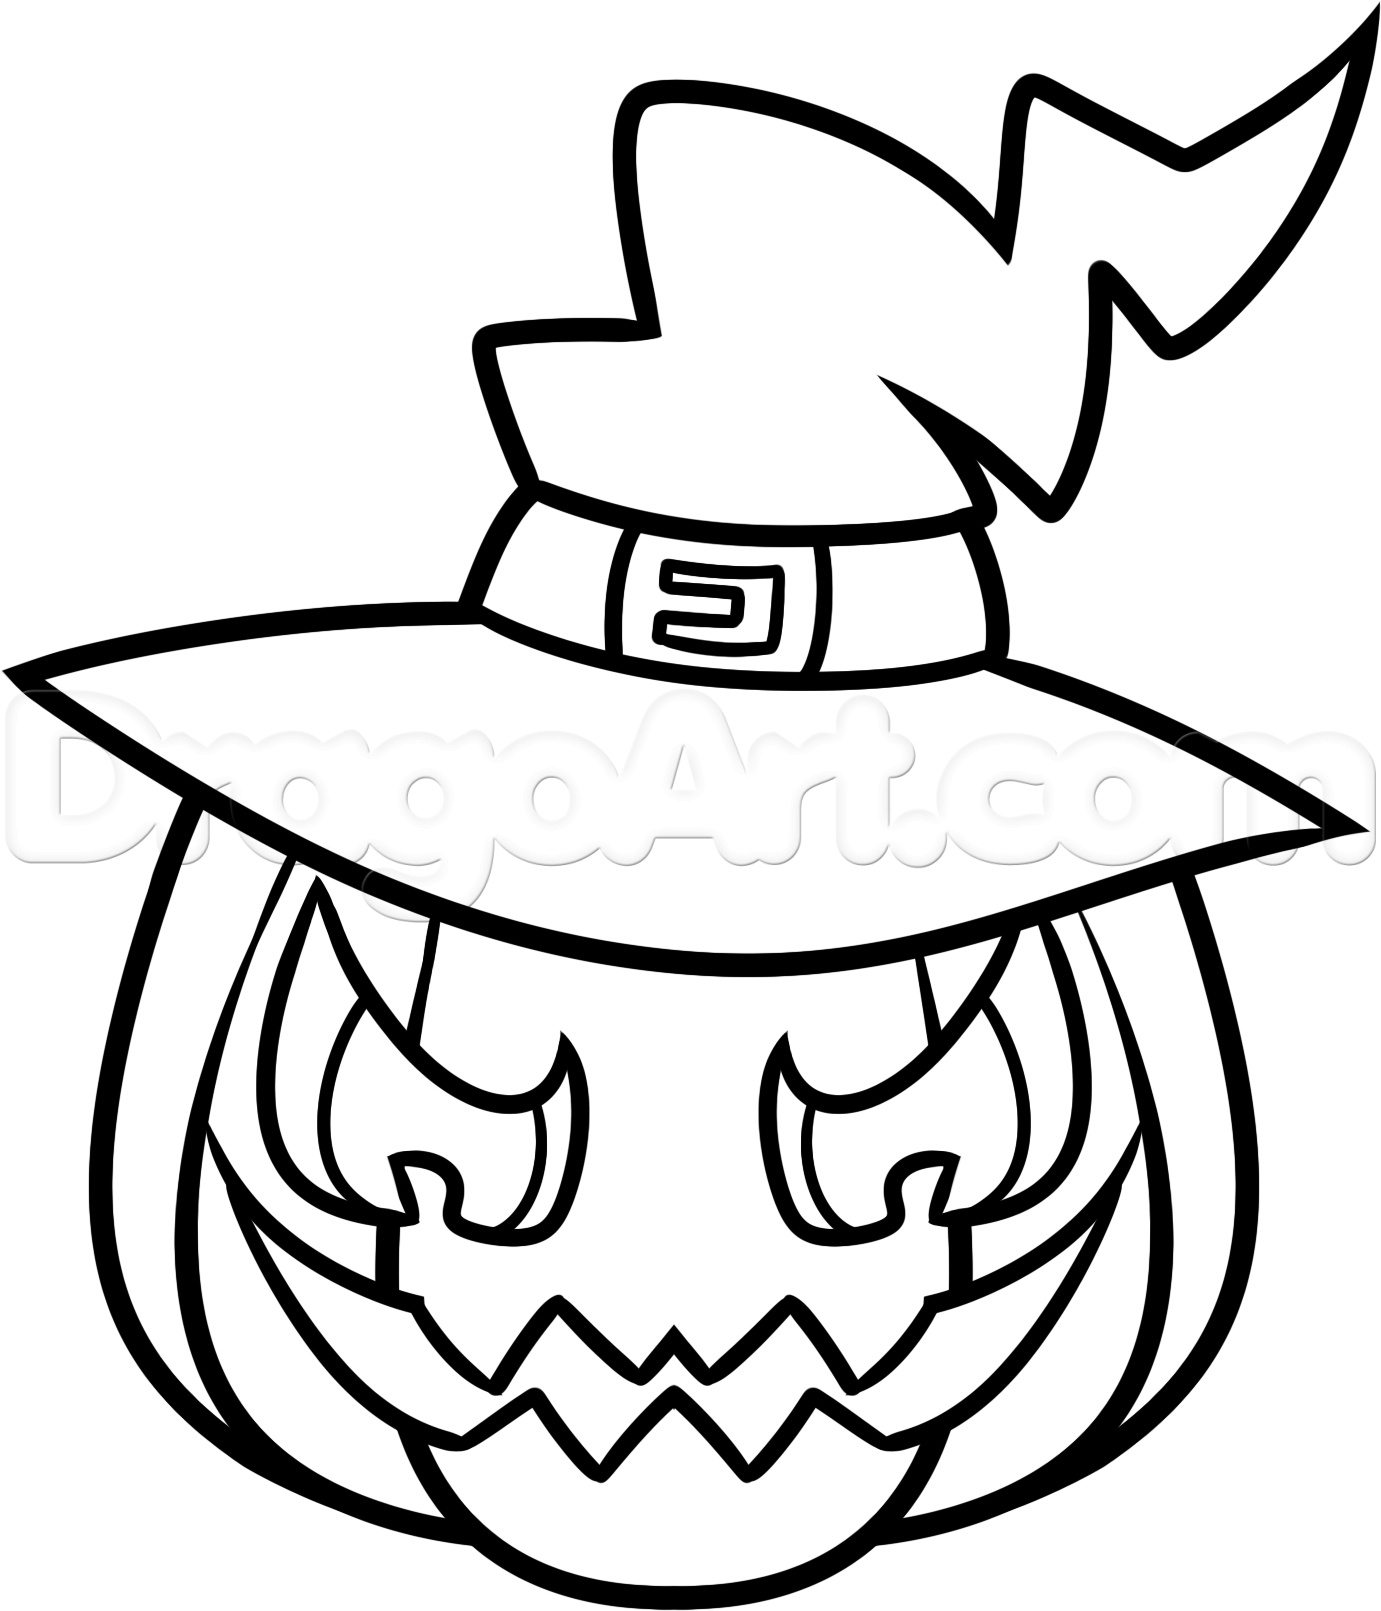 1381x1611 Drawing Of A Pumpkin